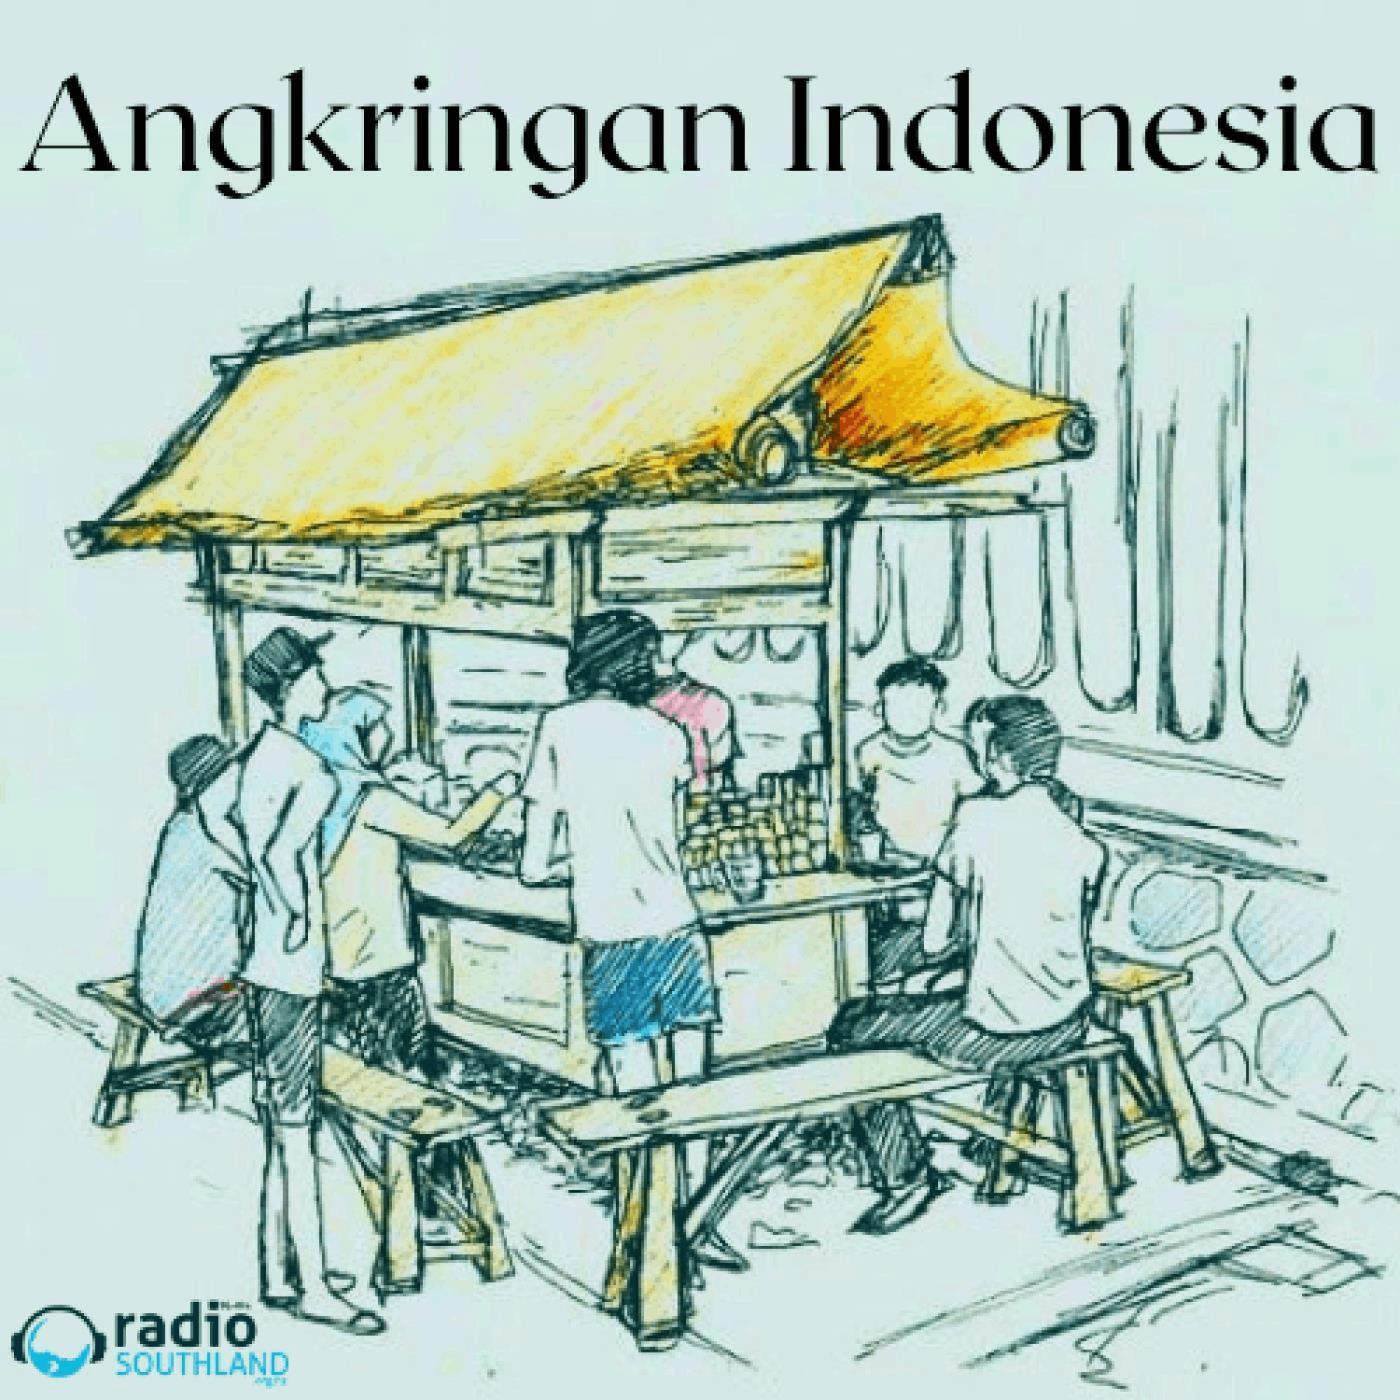 Angkrinkan Indonesia